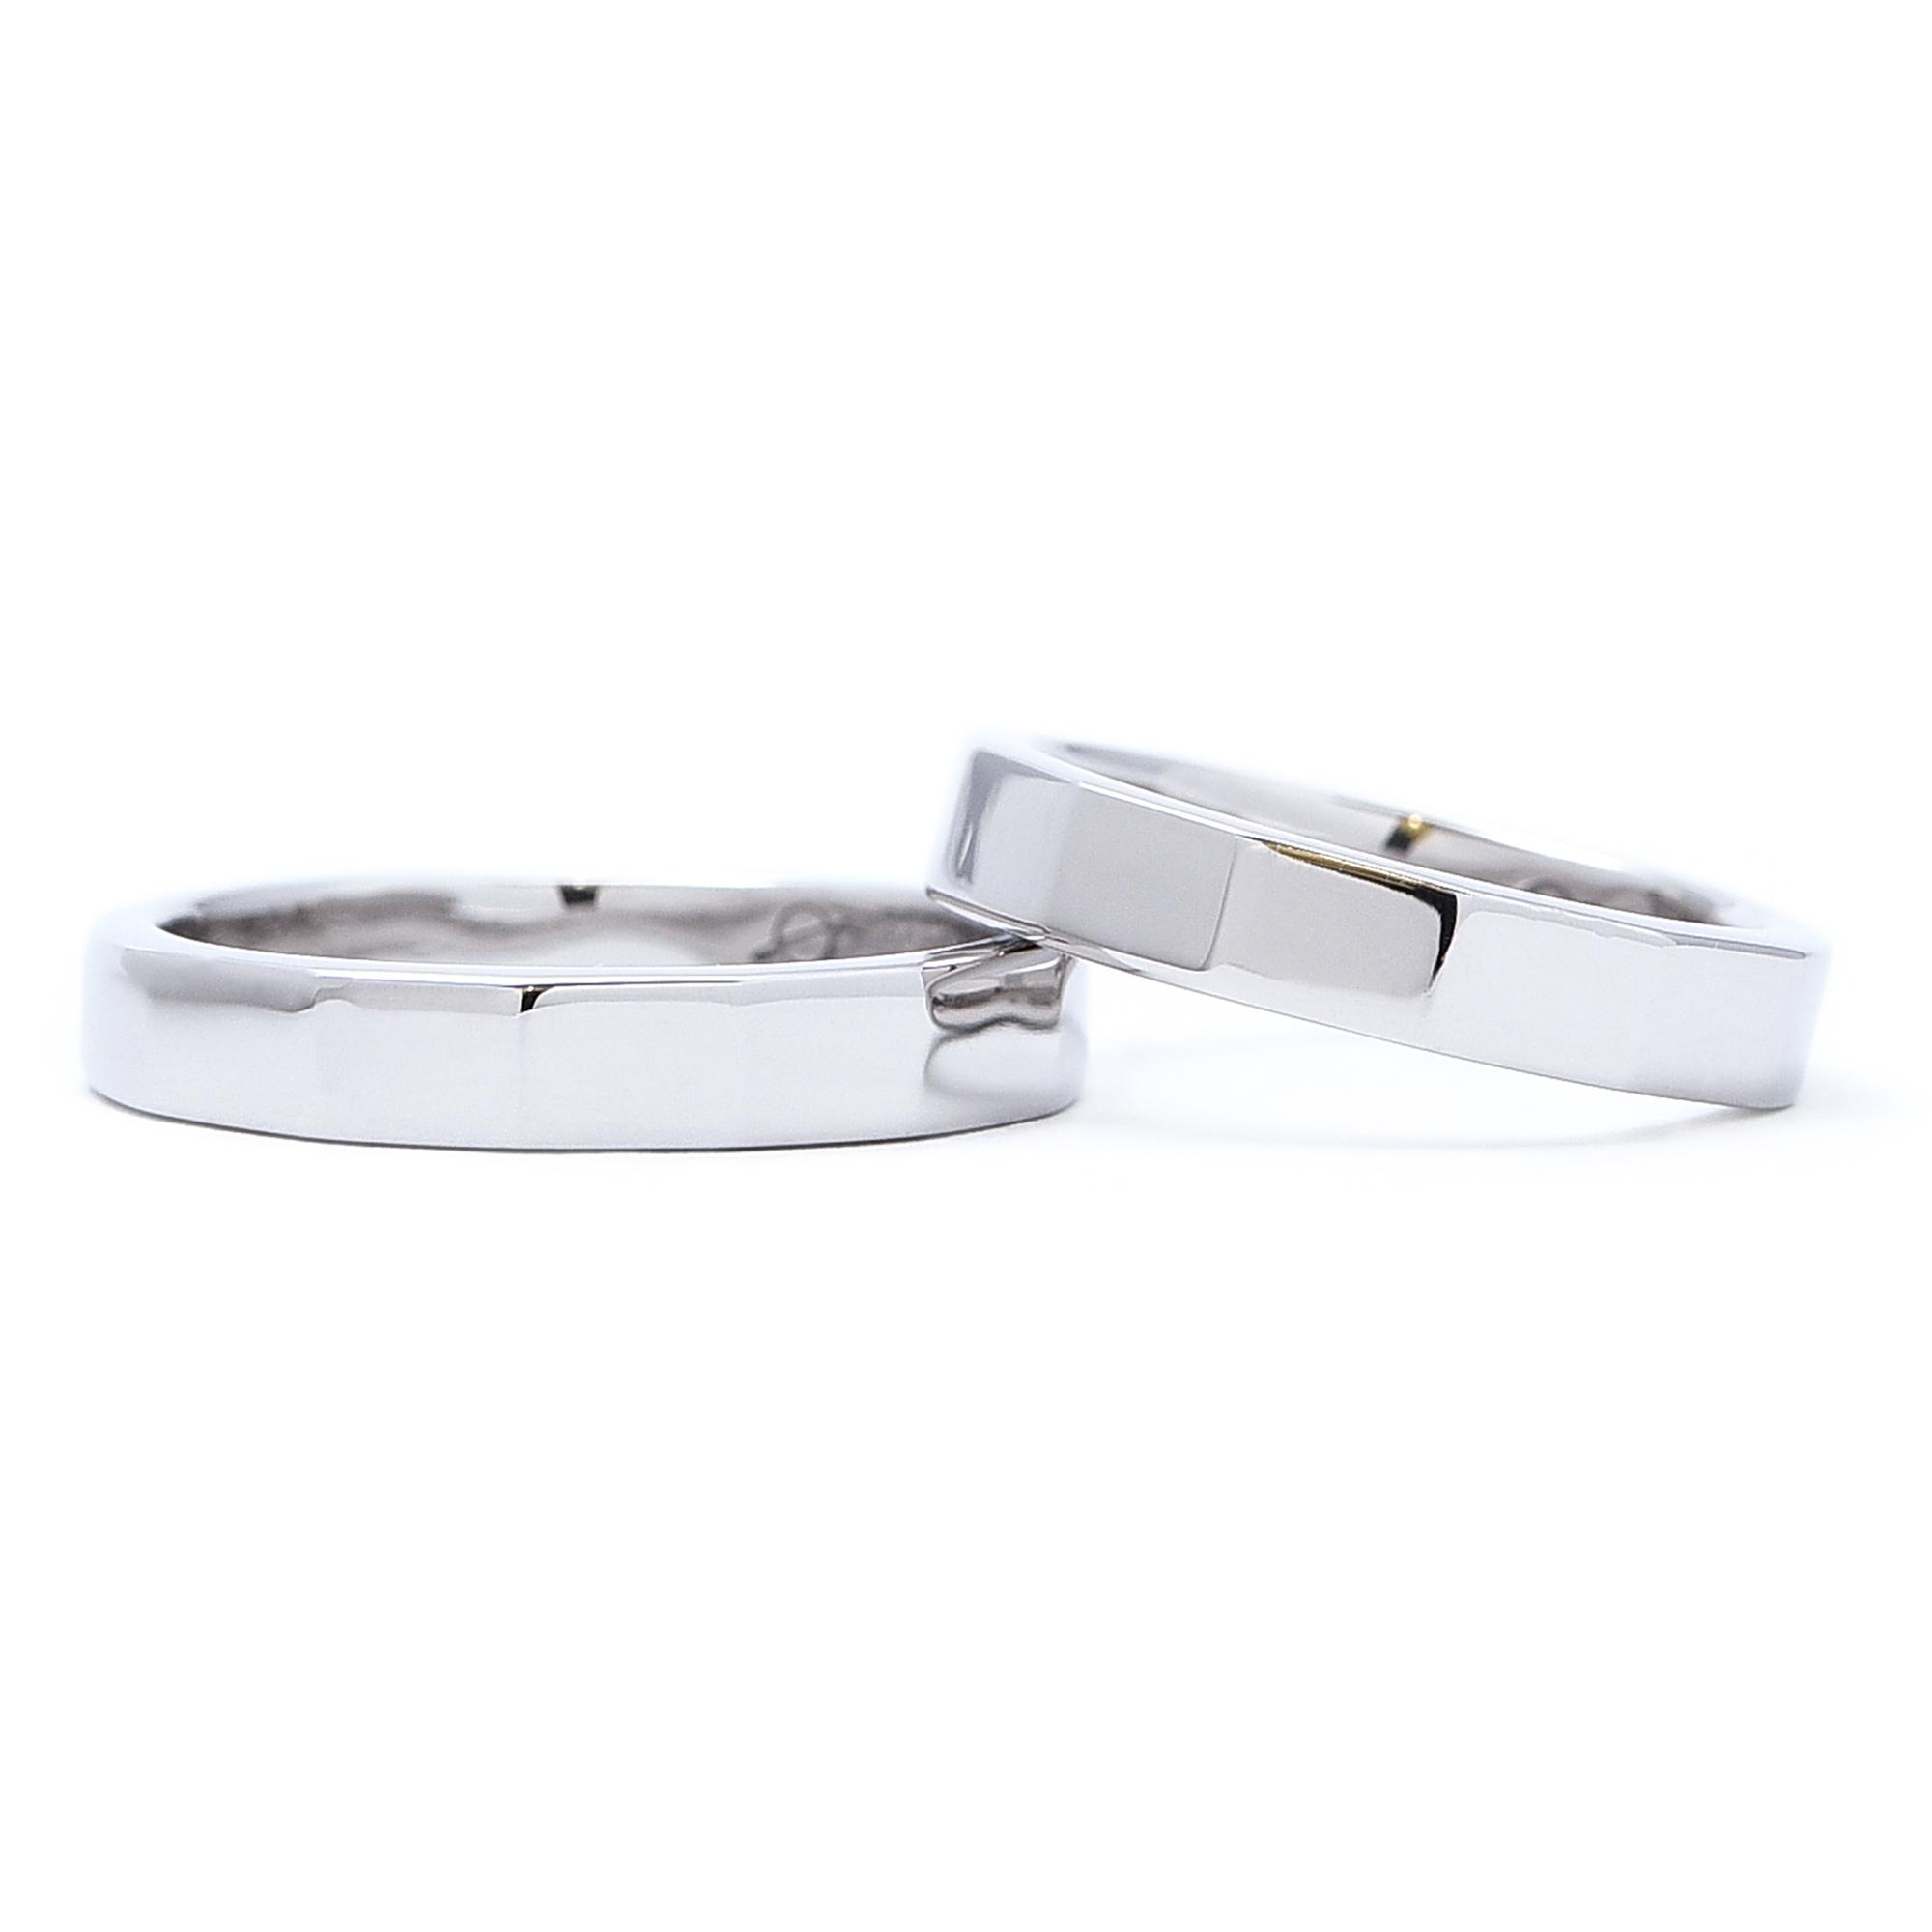 輪高崎工房の結婚指輪|HR-276